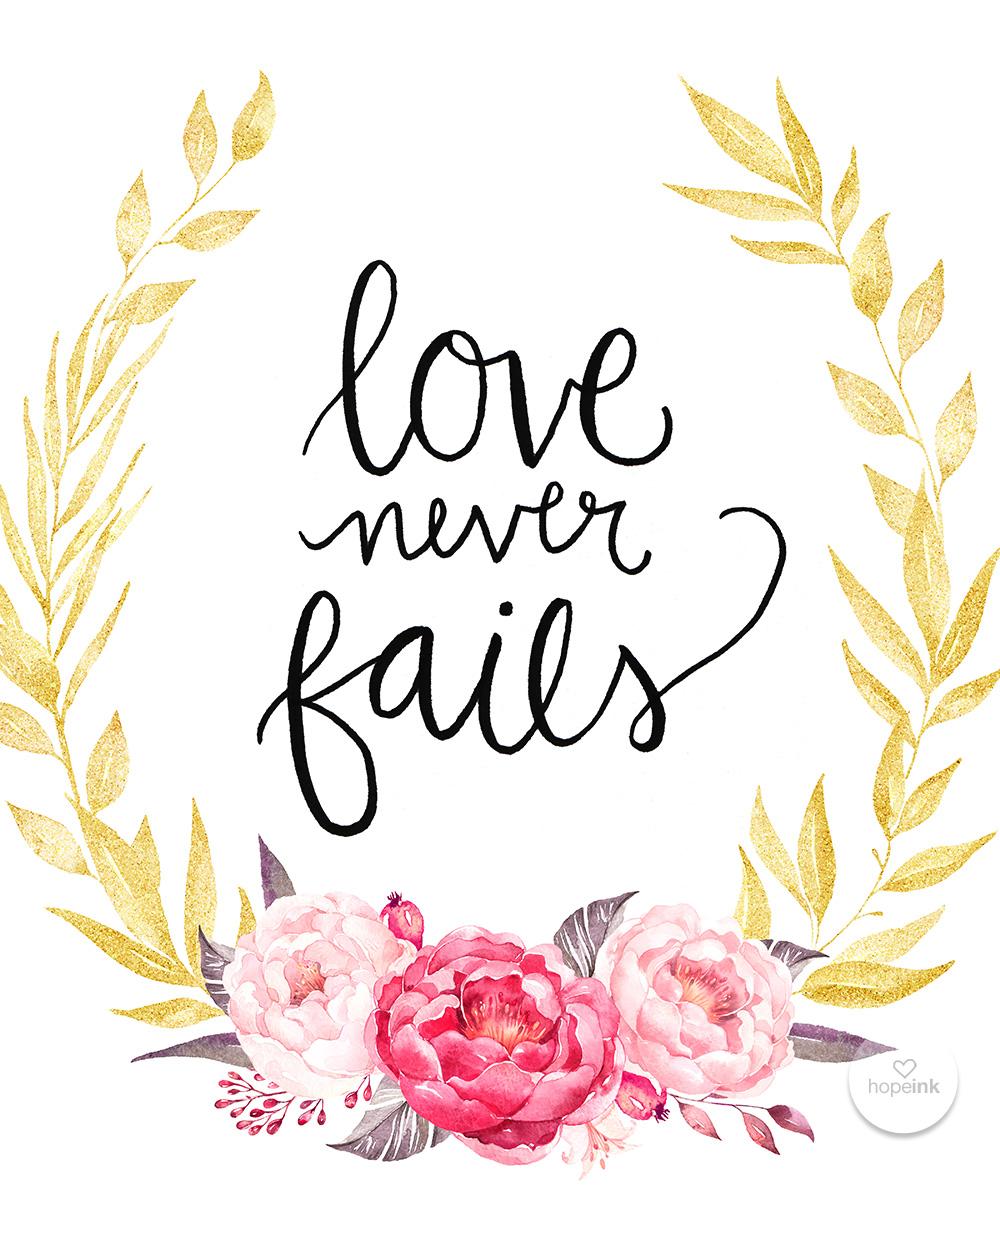 Love Never Fails | Hand Lettered Scripture Art | Hope Ink.jpg